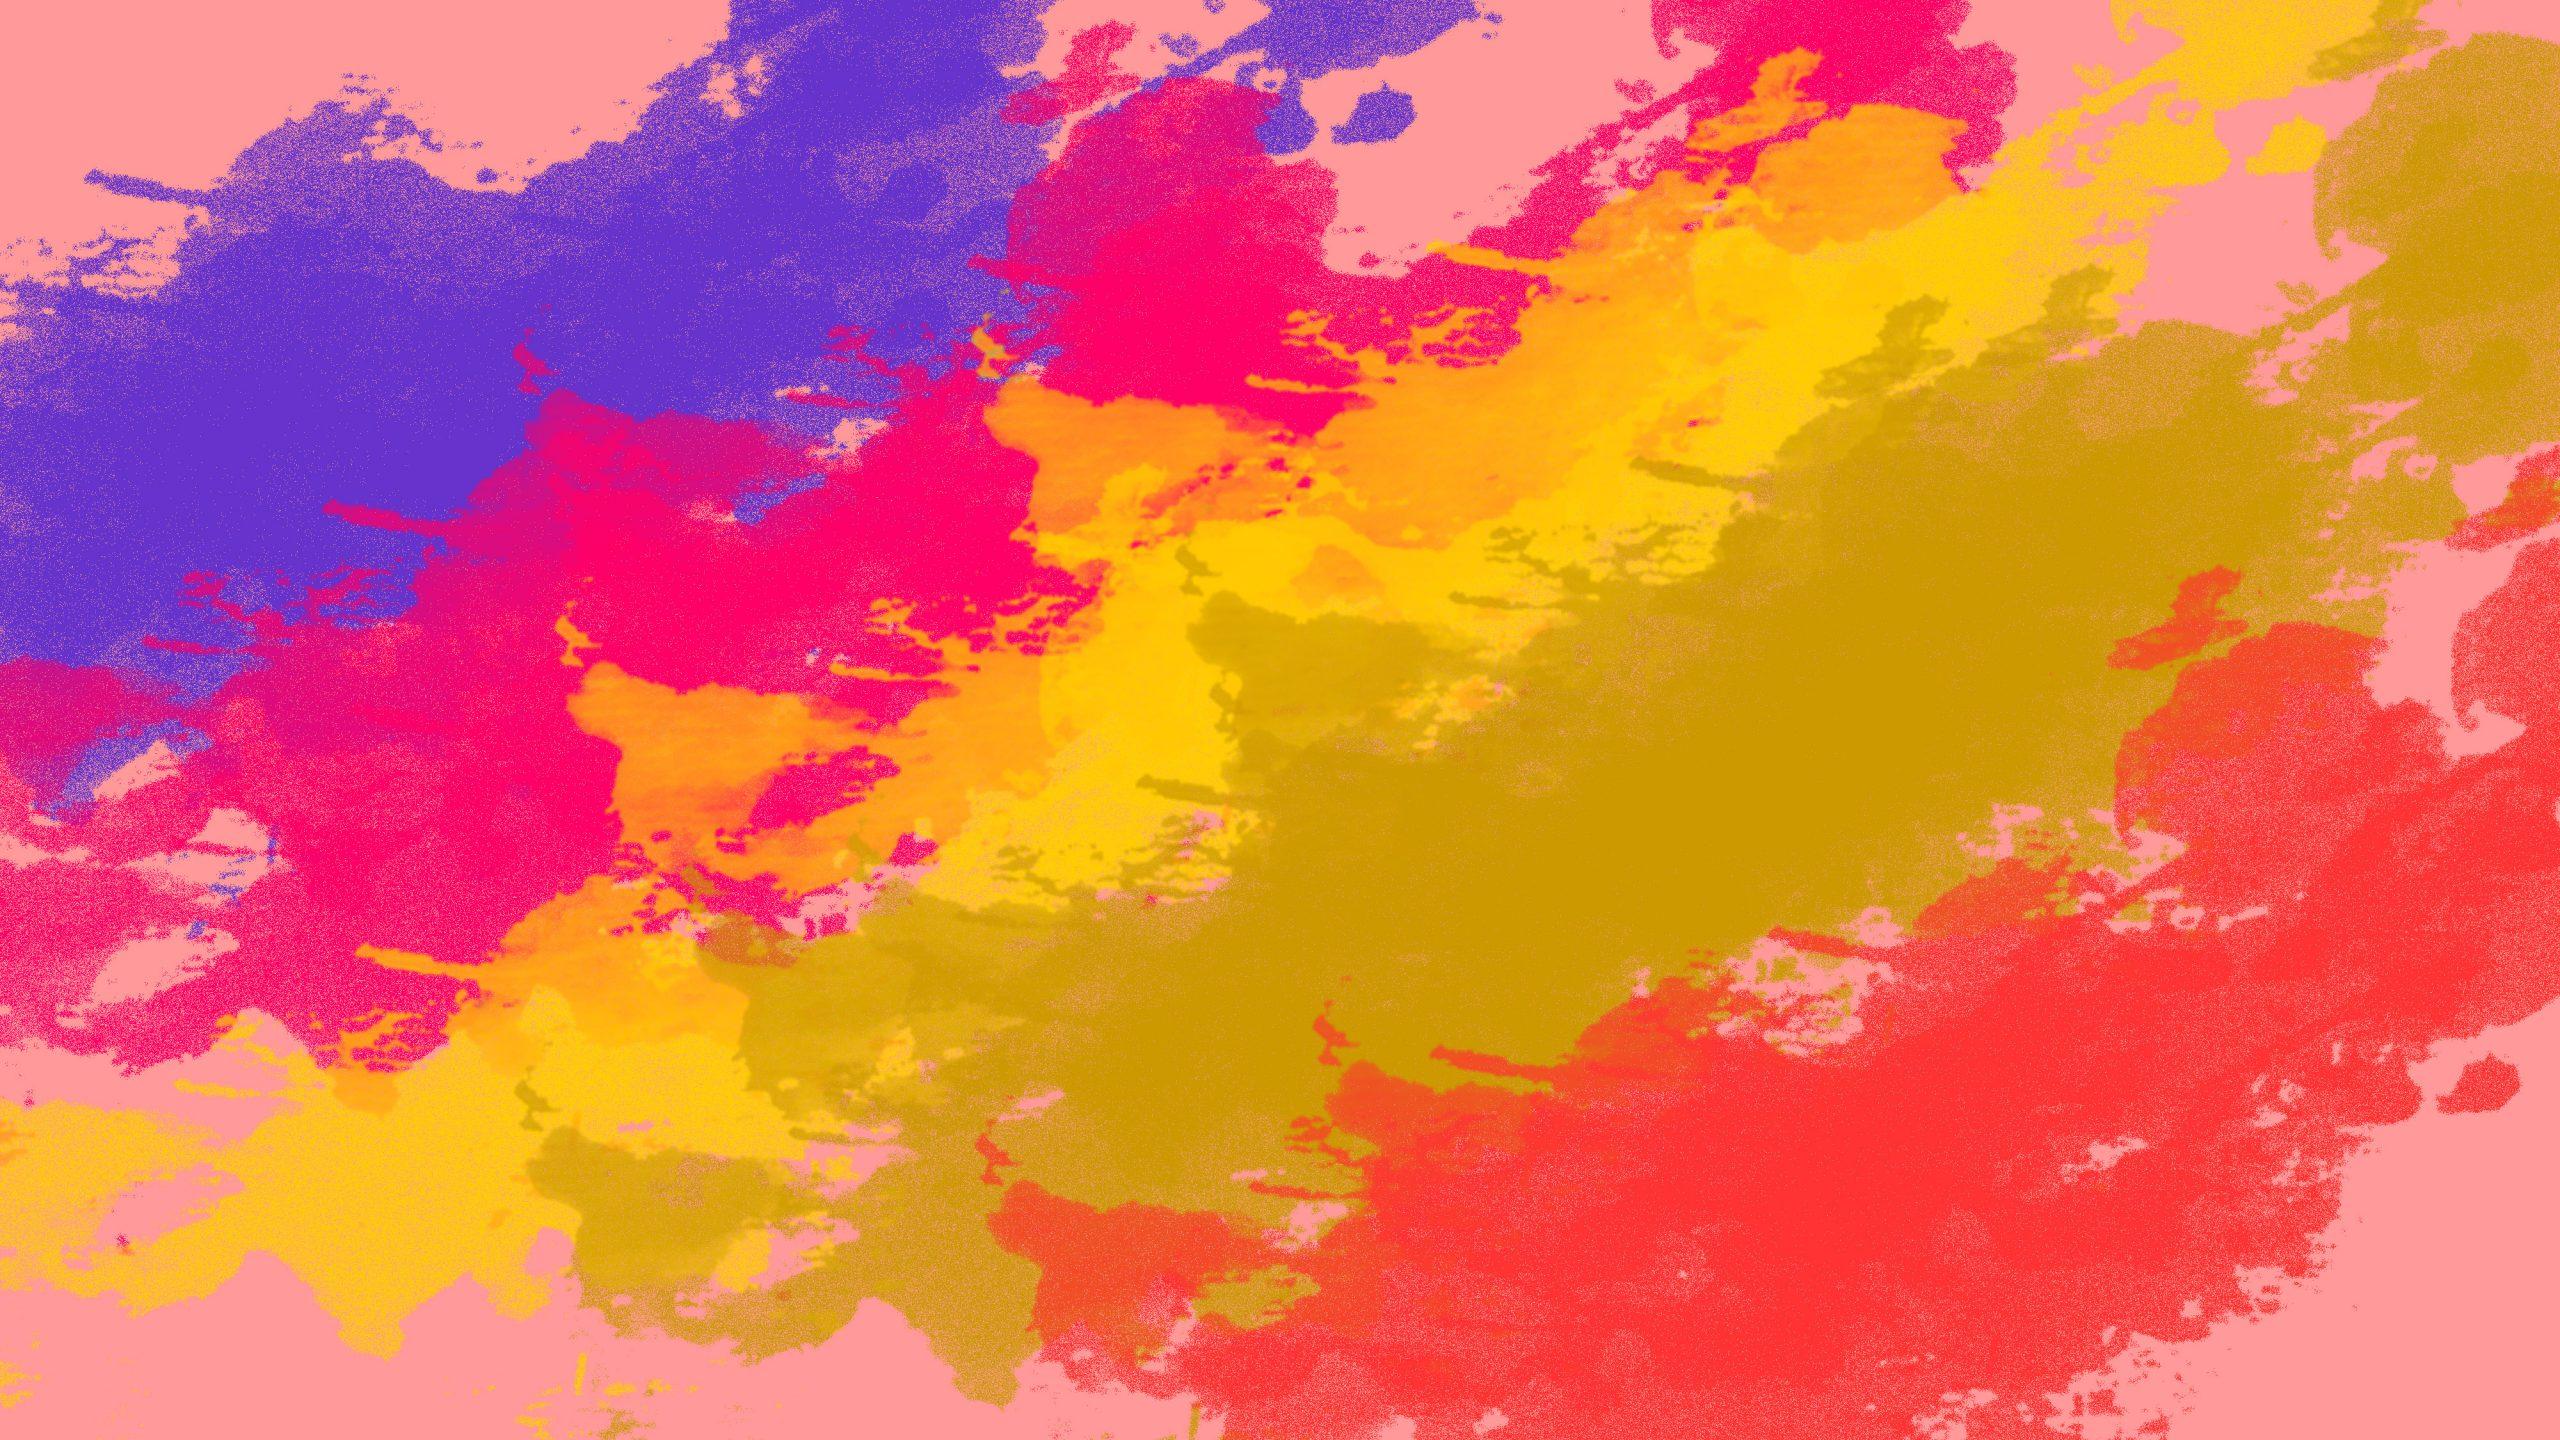 colorful-illustration-background